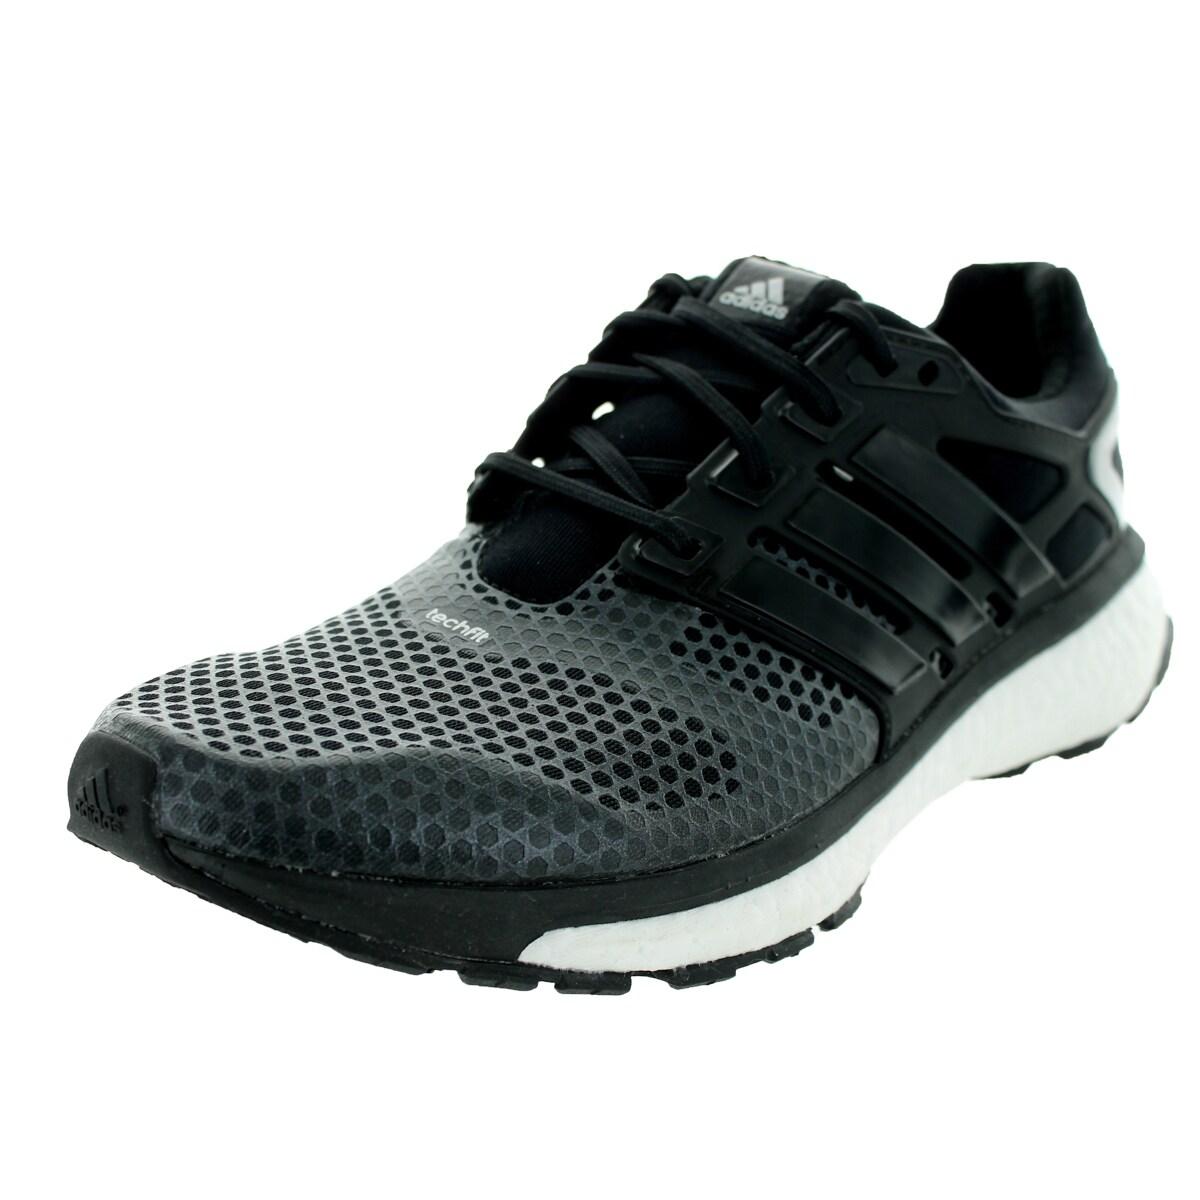 Adidas Men's Energy Boost 2 Atr BlackMetallic Silver Running Shoe